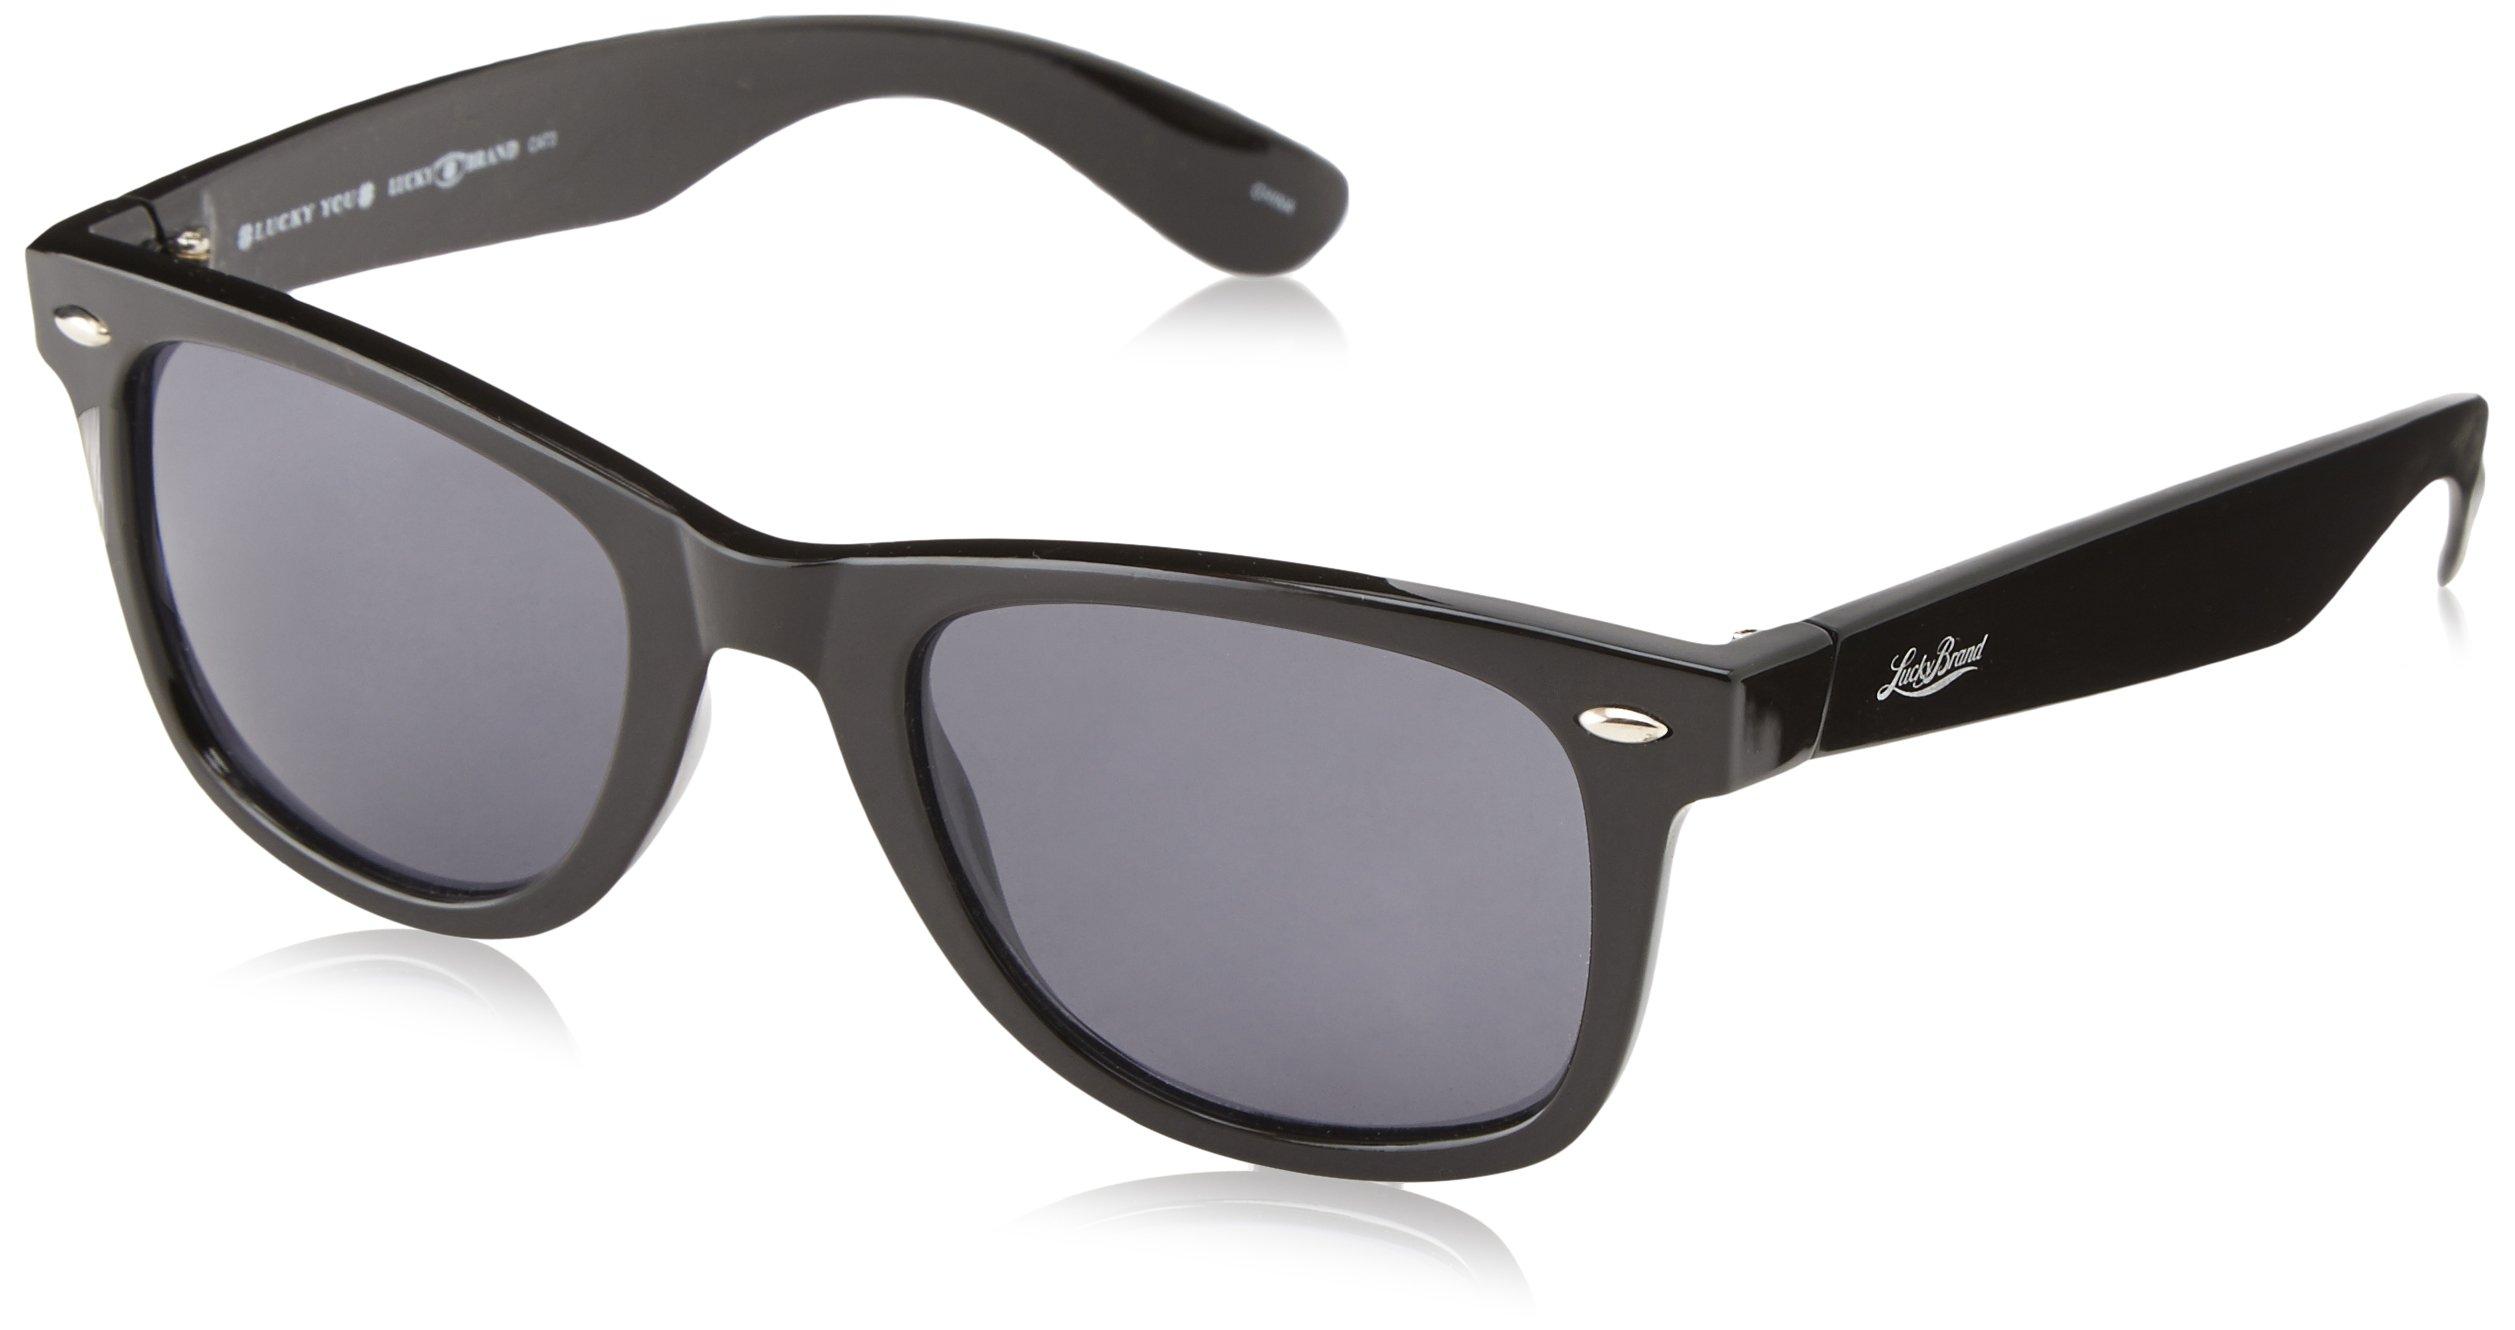 Lucky Duskbla52 Wayfarer Sunglasses, Black, 52 mm